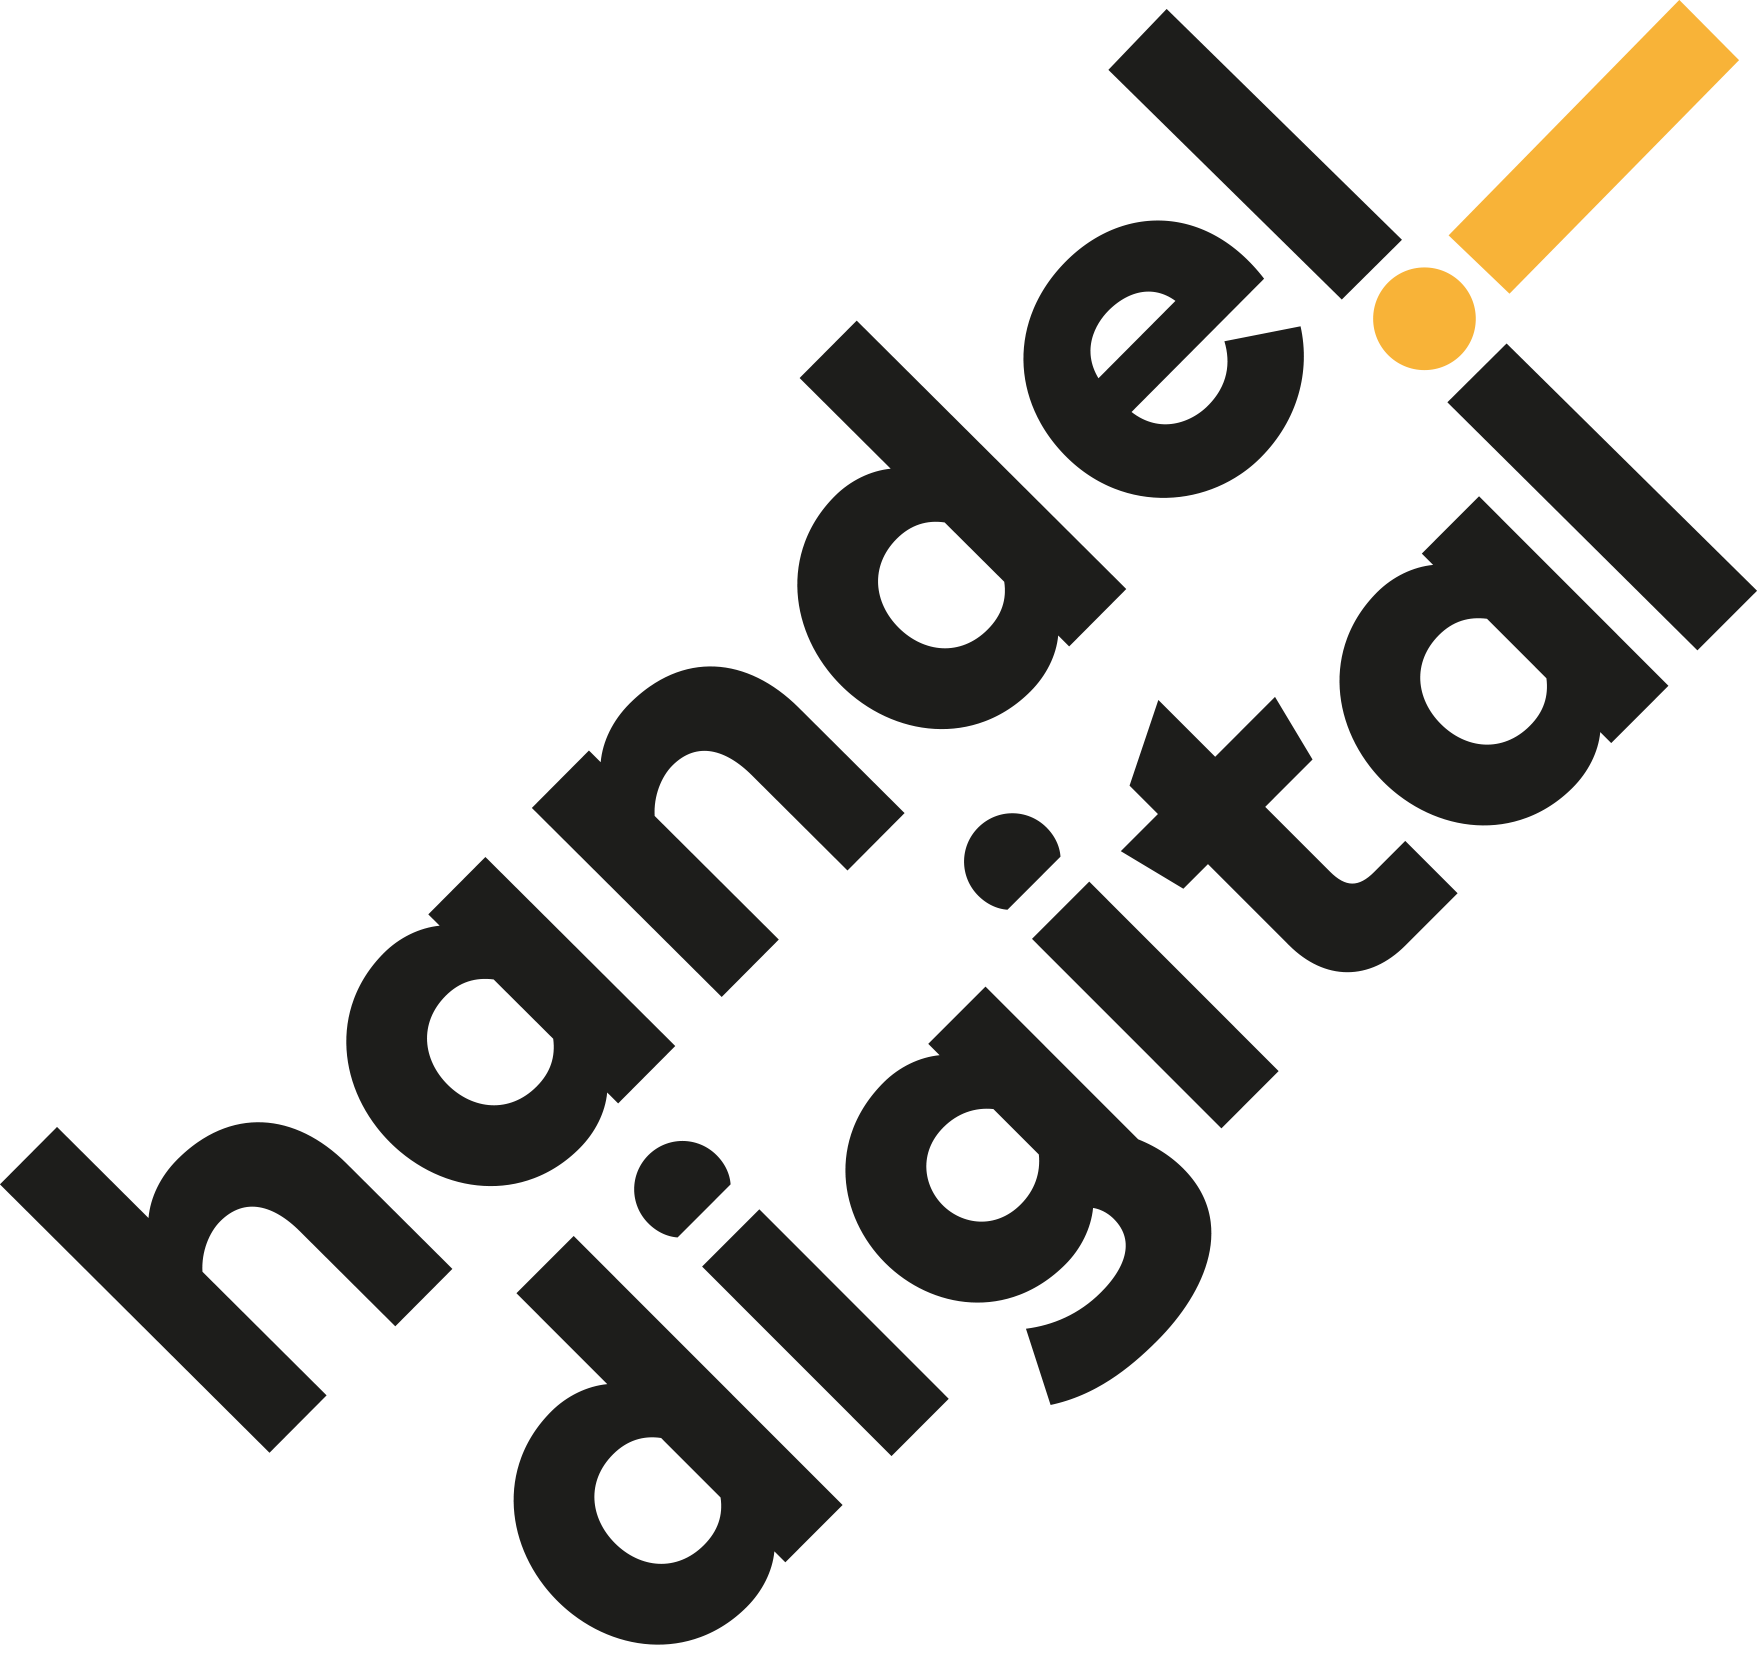 Handel Digital 1. Digi-Level der Digitalisierung